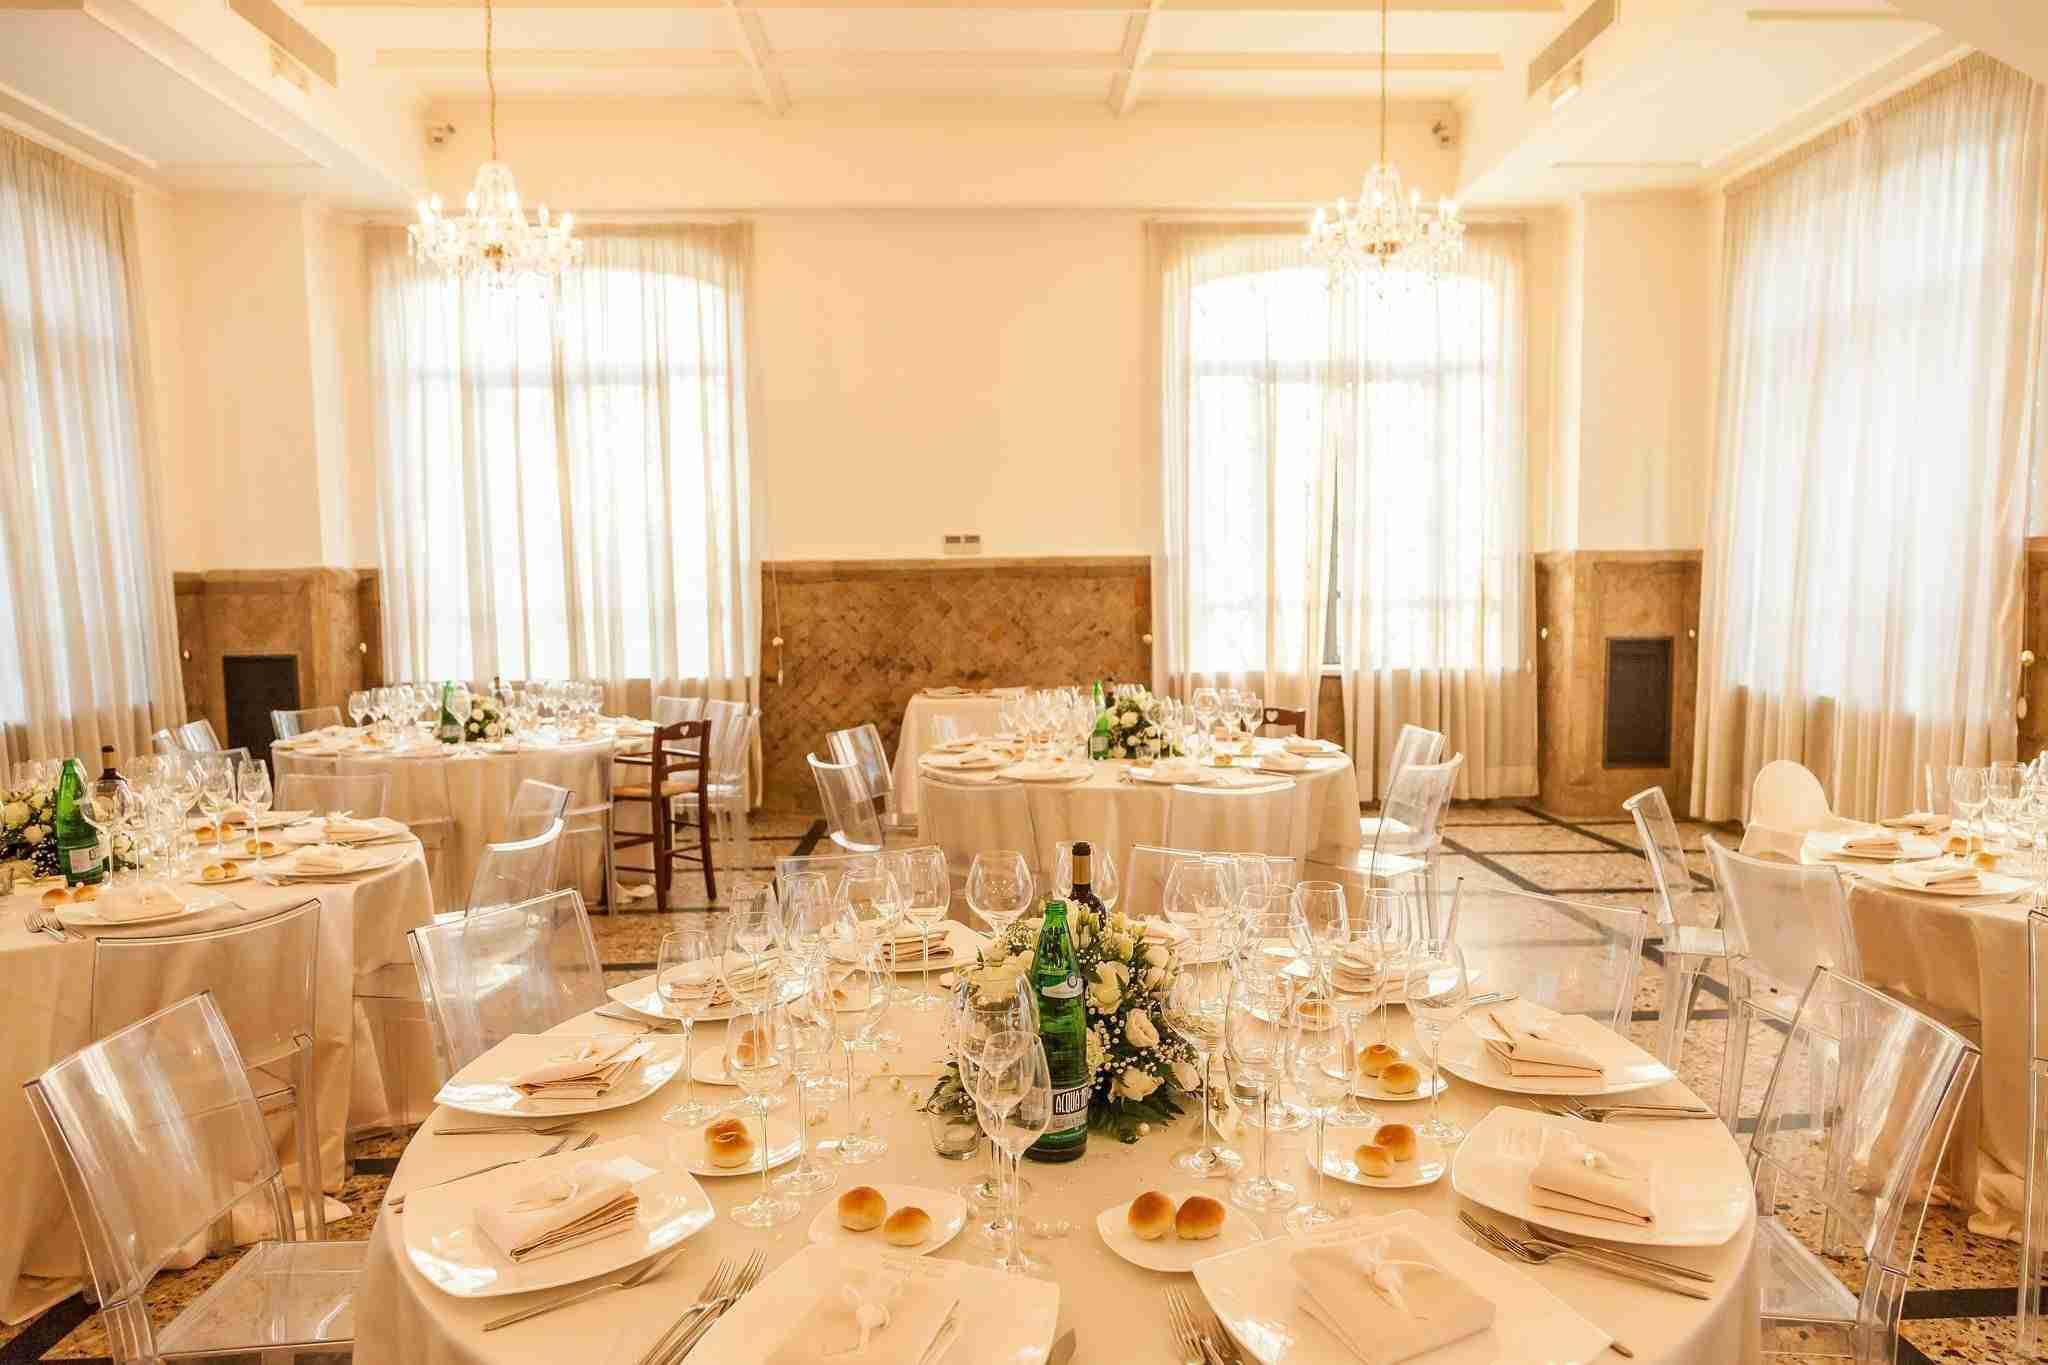 Matrimonio a Villa dei Cesari: Sala Ricevimento